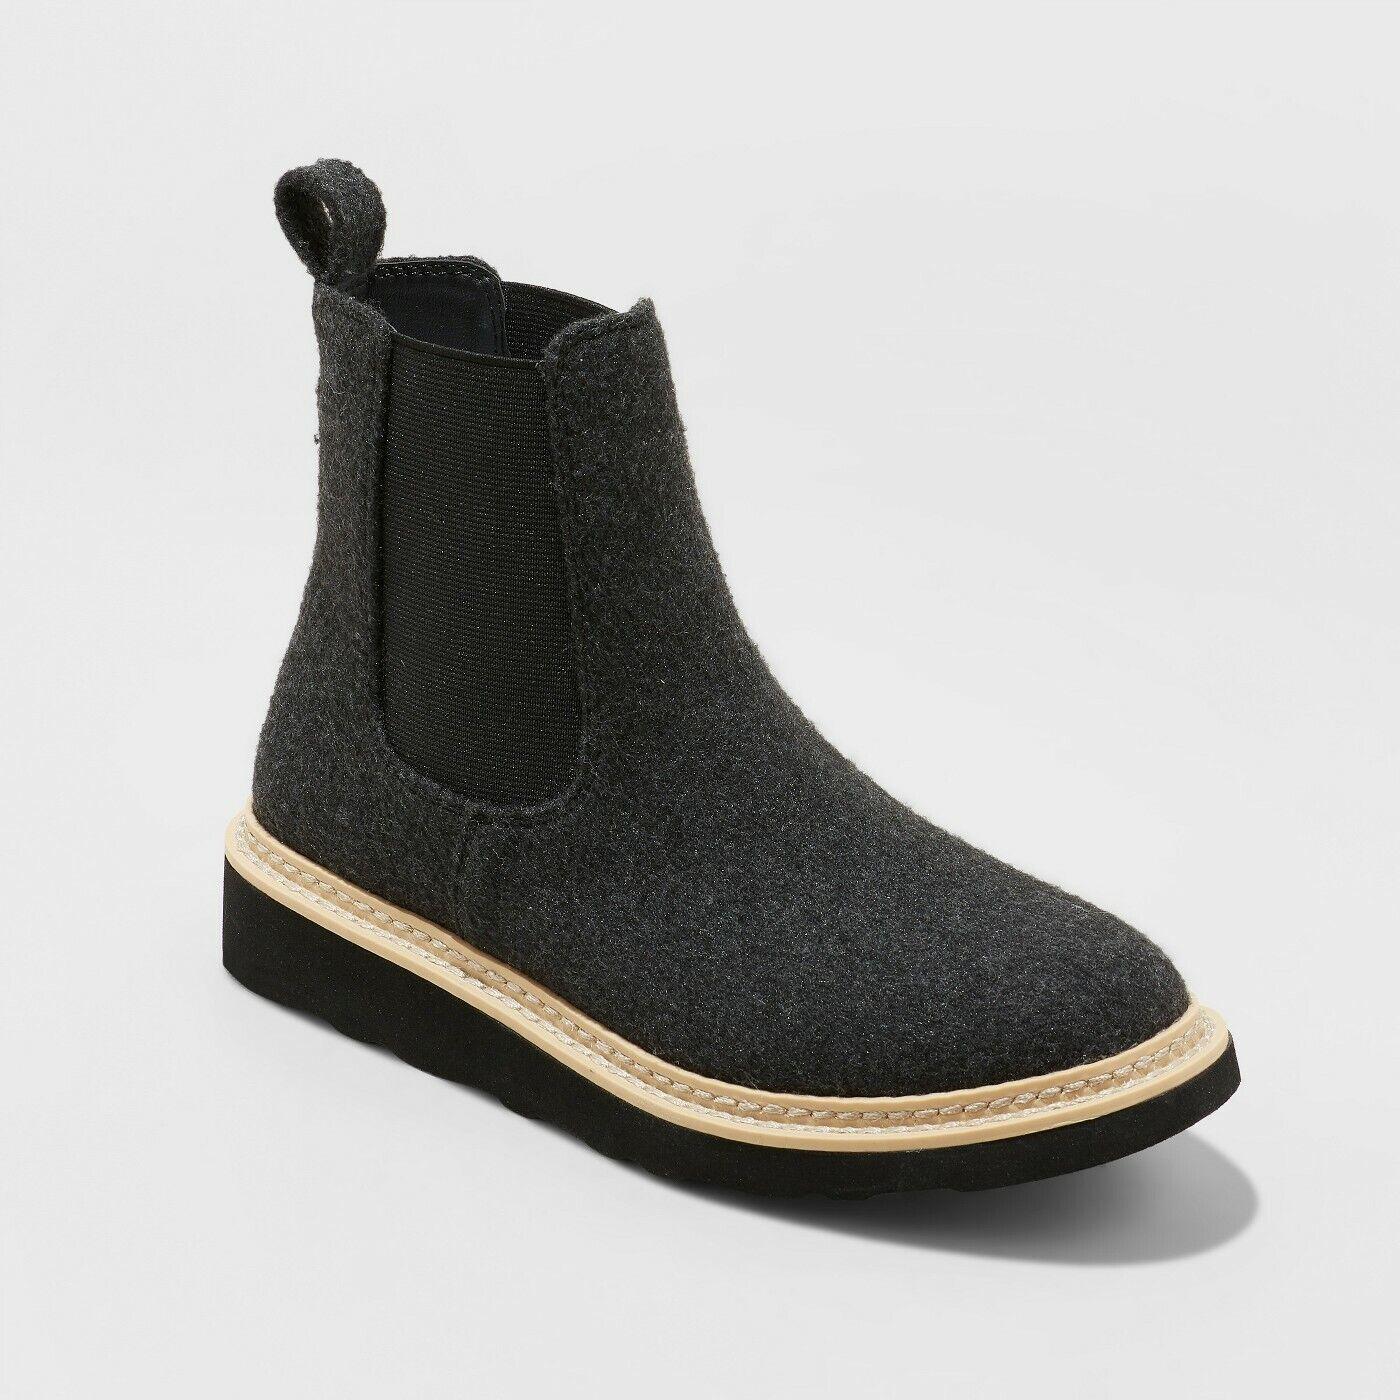 NWT Women's Dawn Fashion Sneakers Boots - Universal Thread